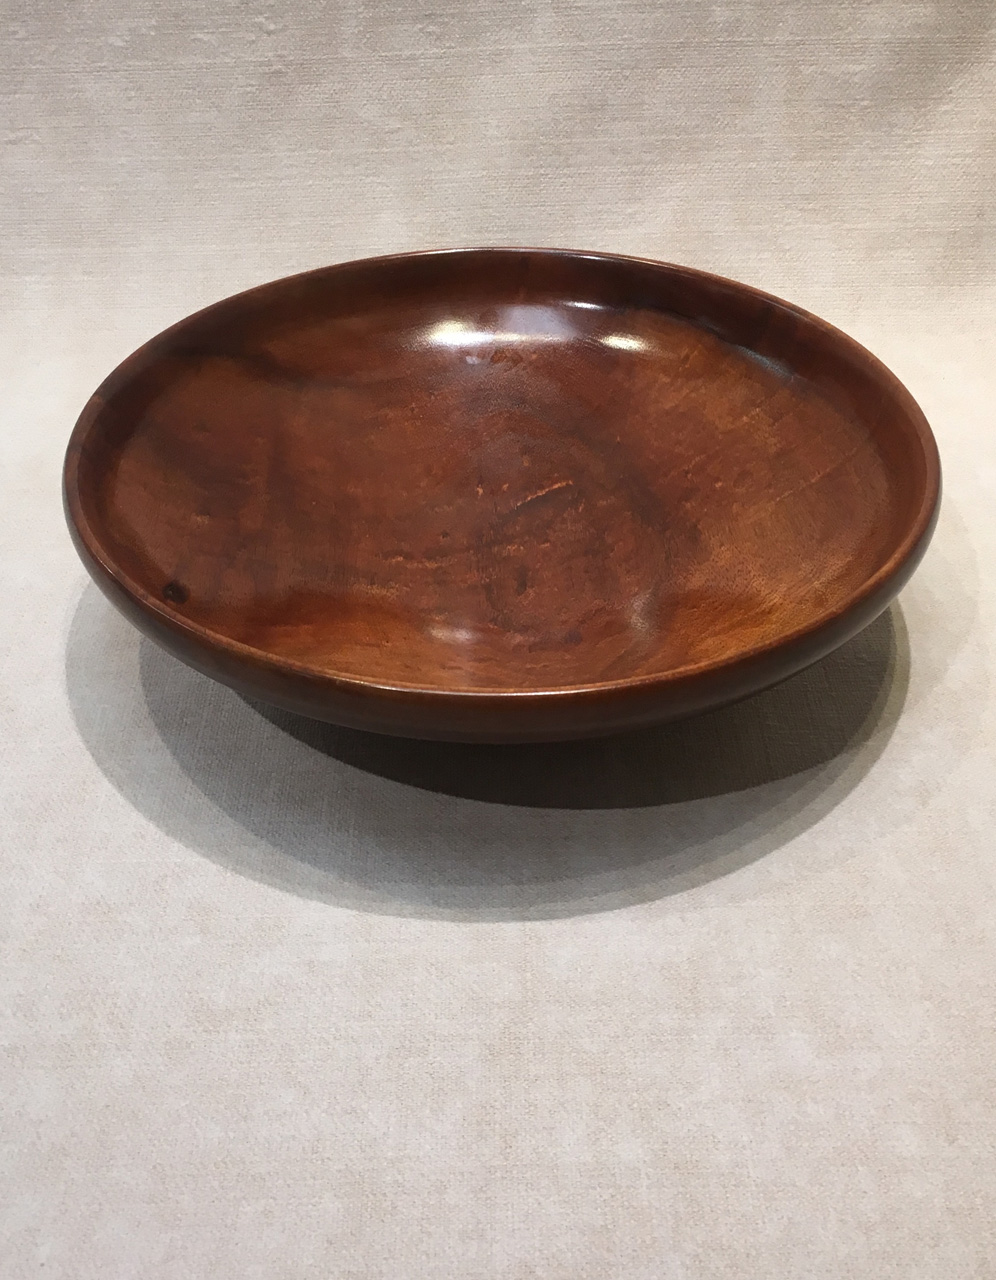 Koa Bowl by Debbie and Parker Nicholson